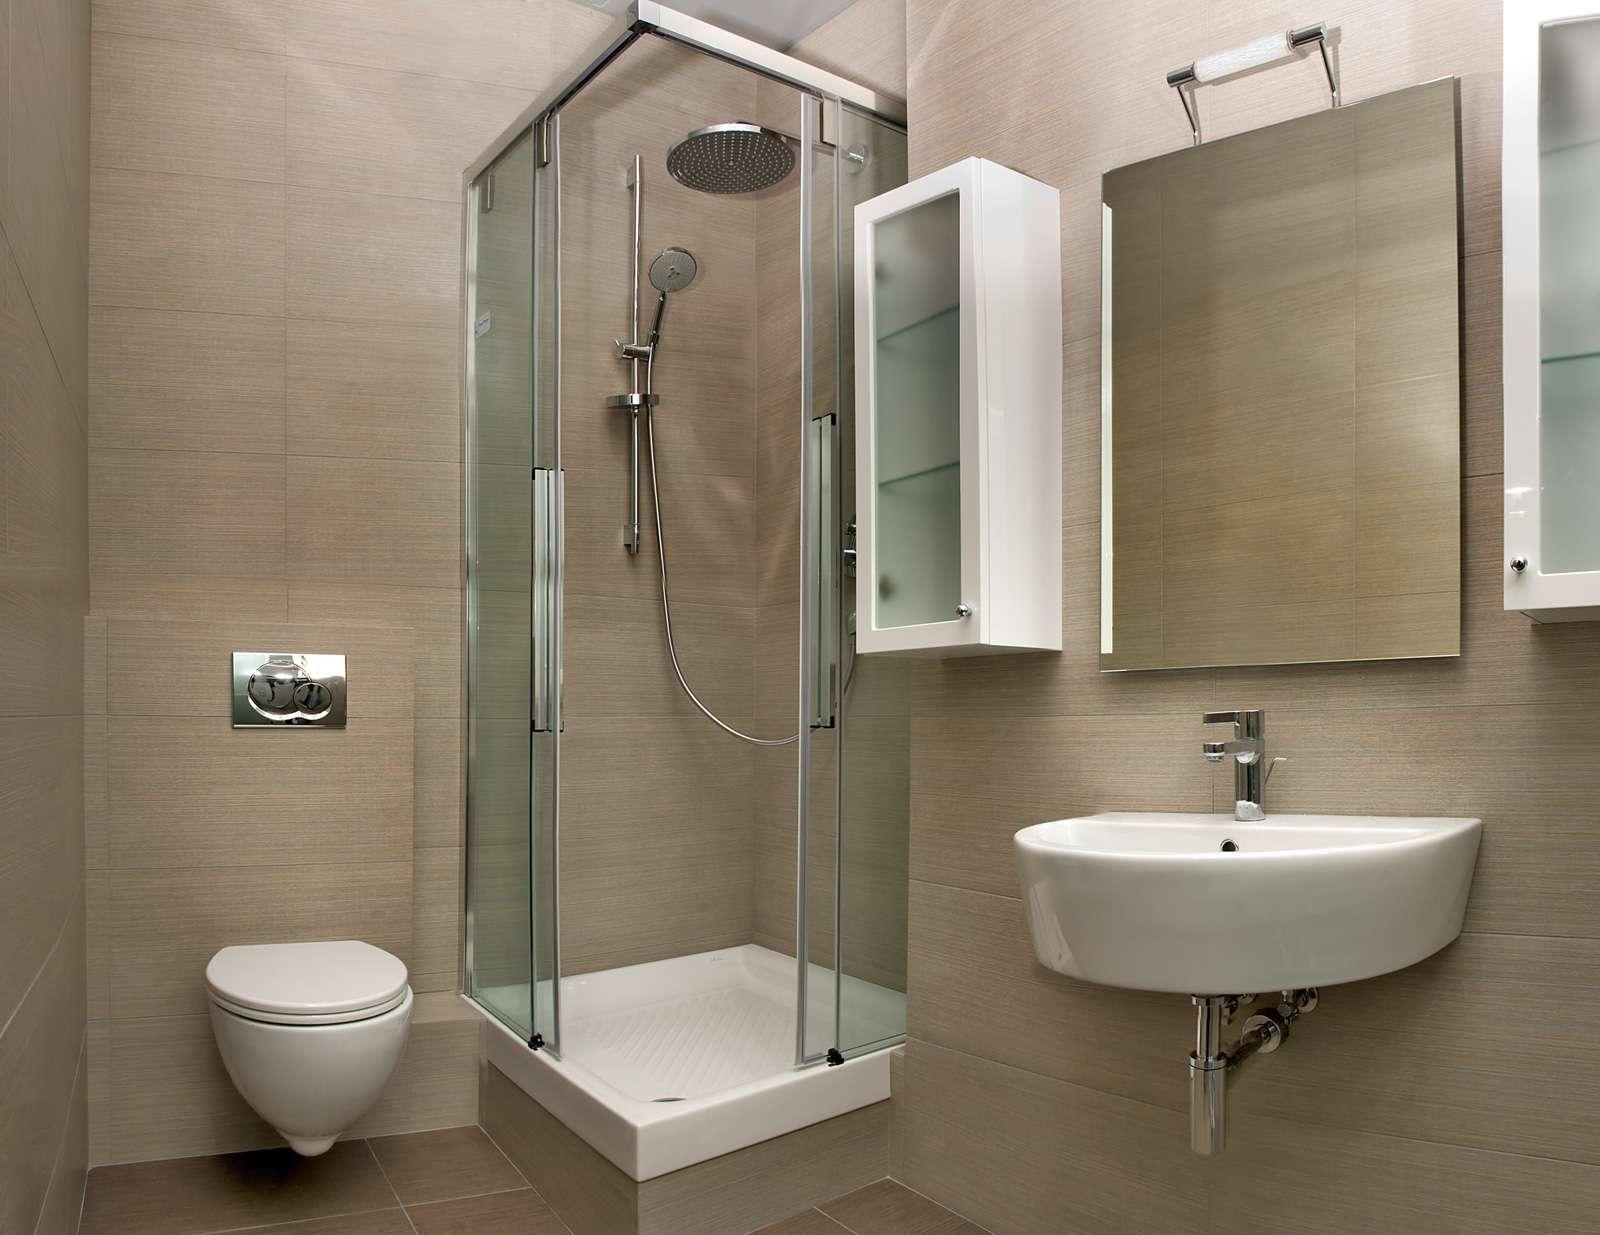 Bathroom Small Shower Designs Interior Design Ideas Flats